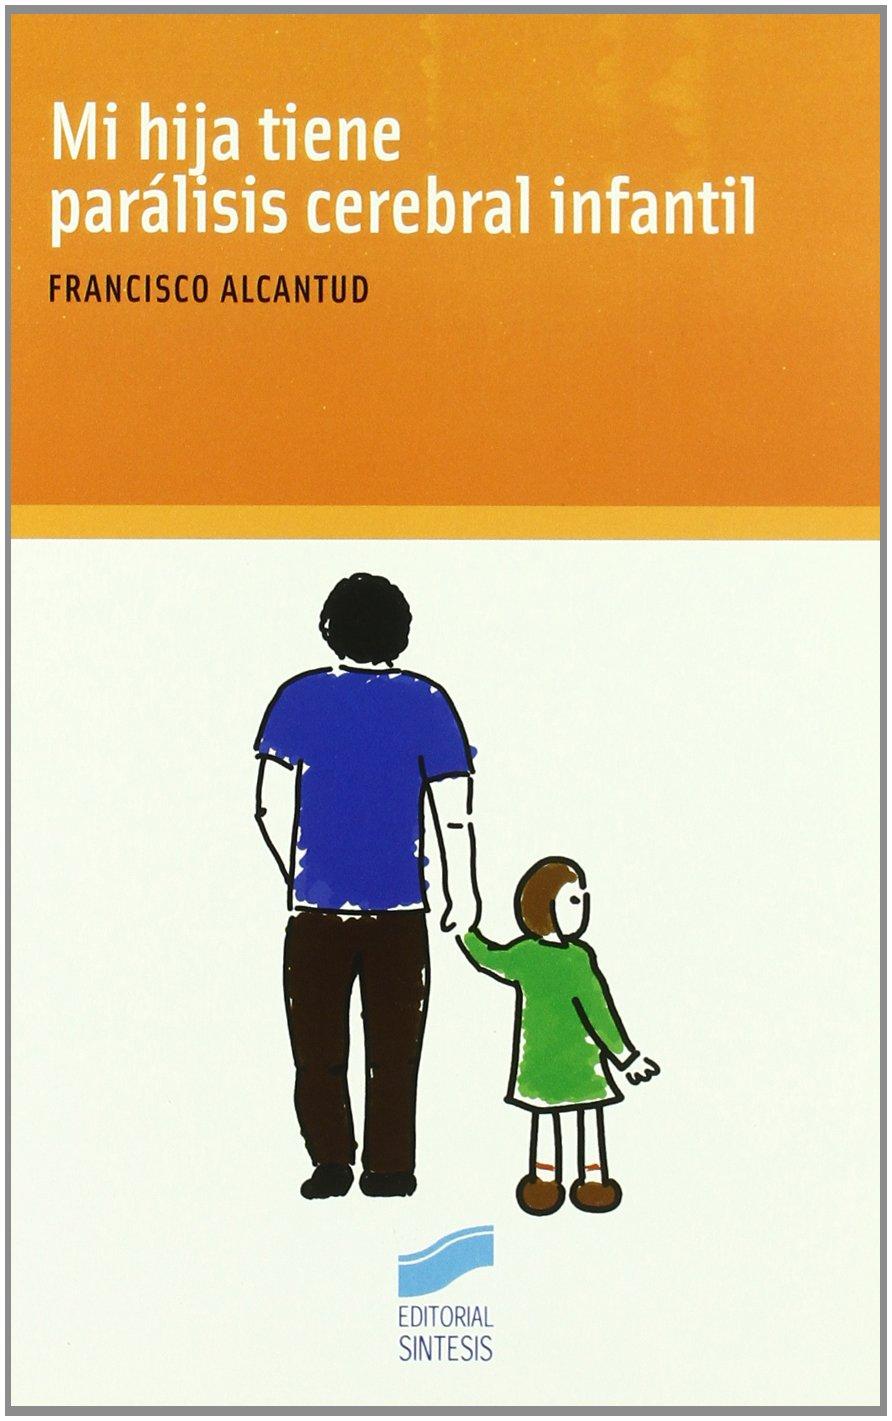 Mi hija tiene paralisis cerebral infantil/ My Daughter Suffers from Cerebral Palsy (Ninos, adolescentes, padres/ Children, Teens, Parents) (Spanish Edition) pdf